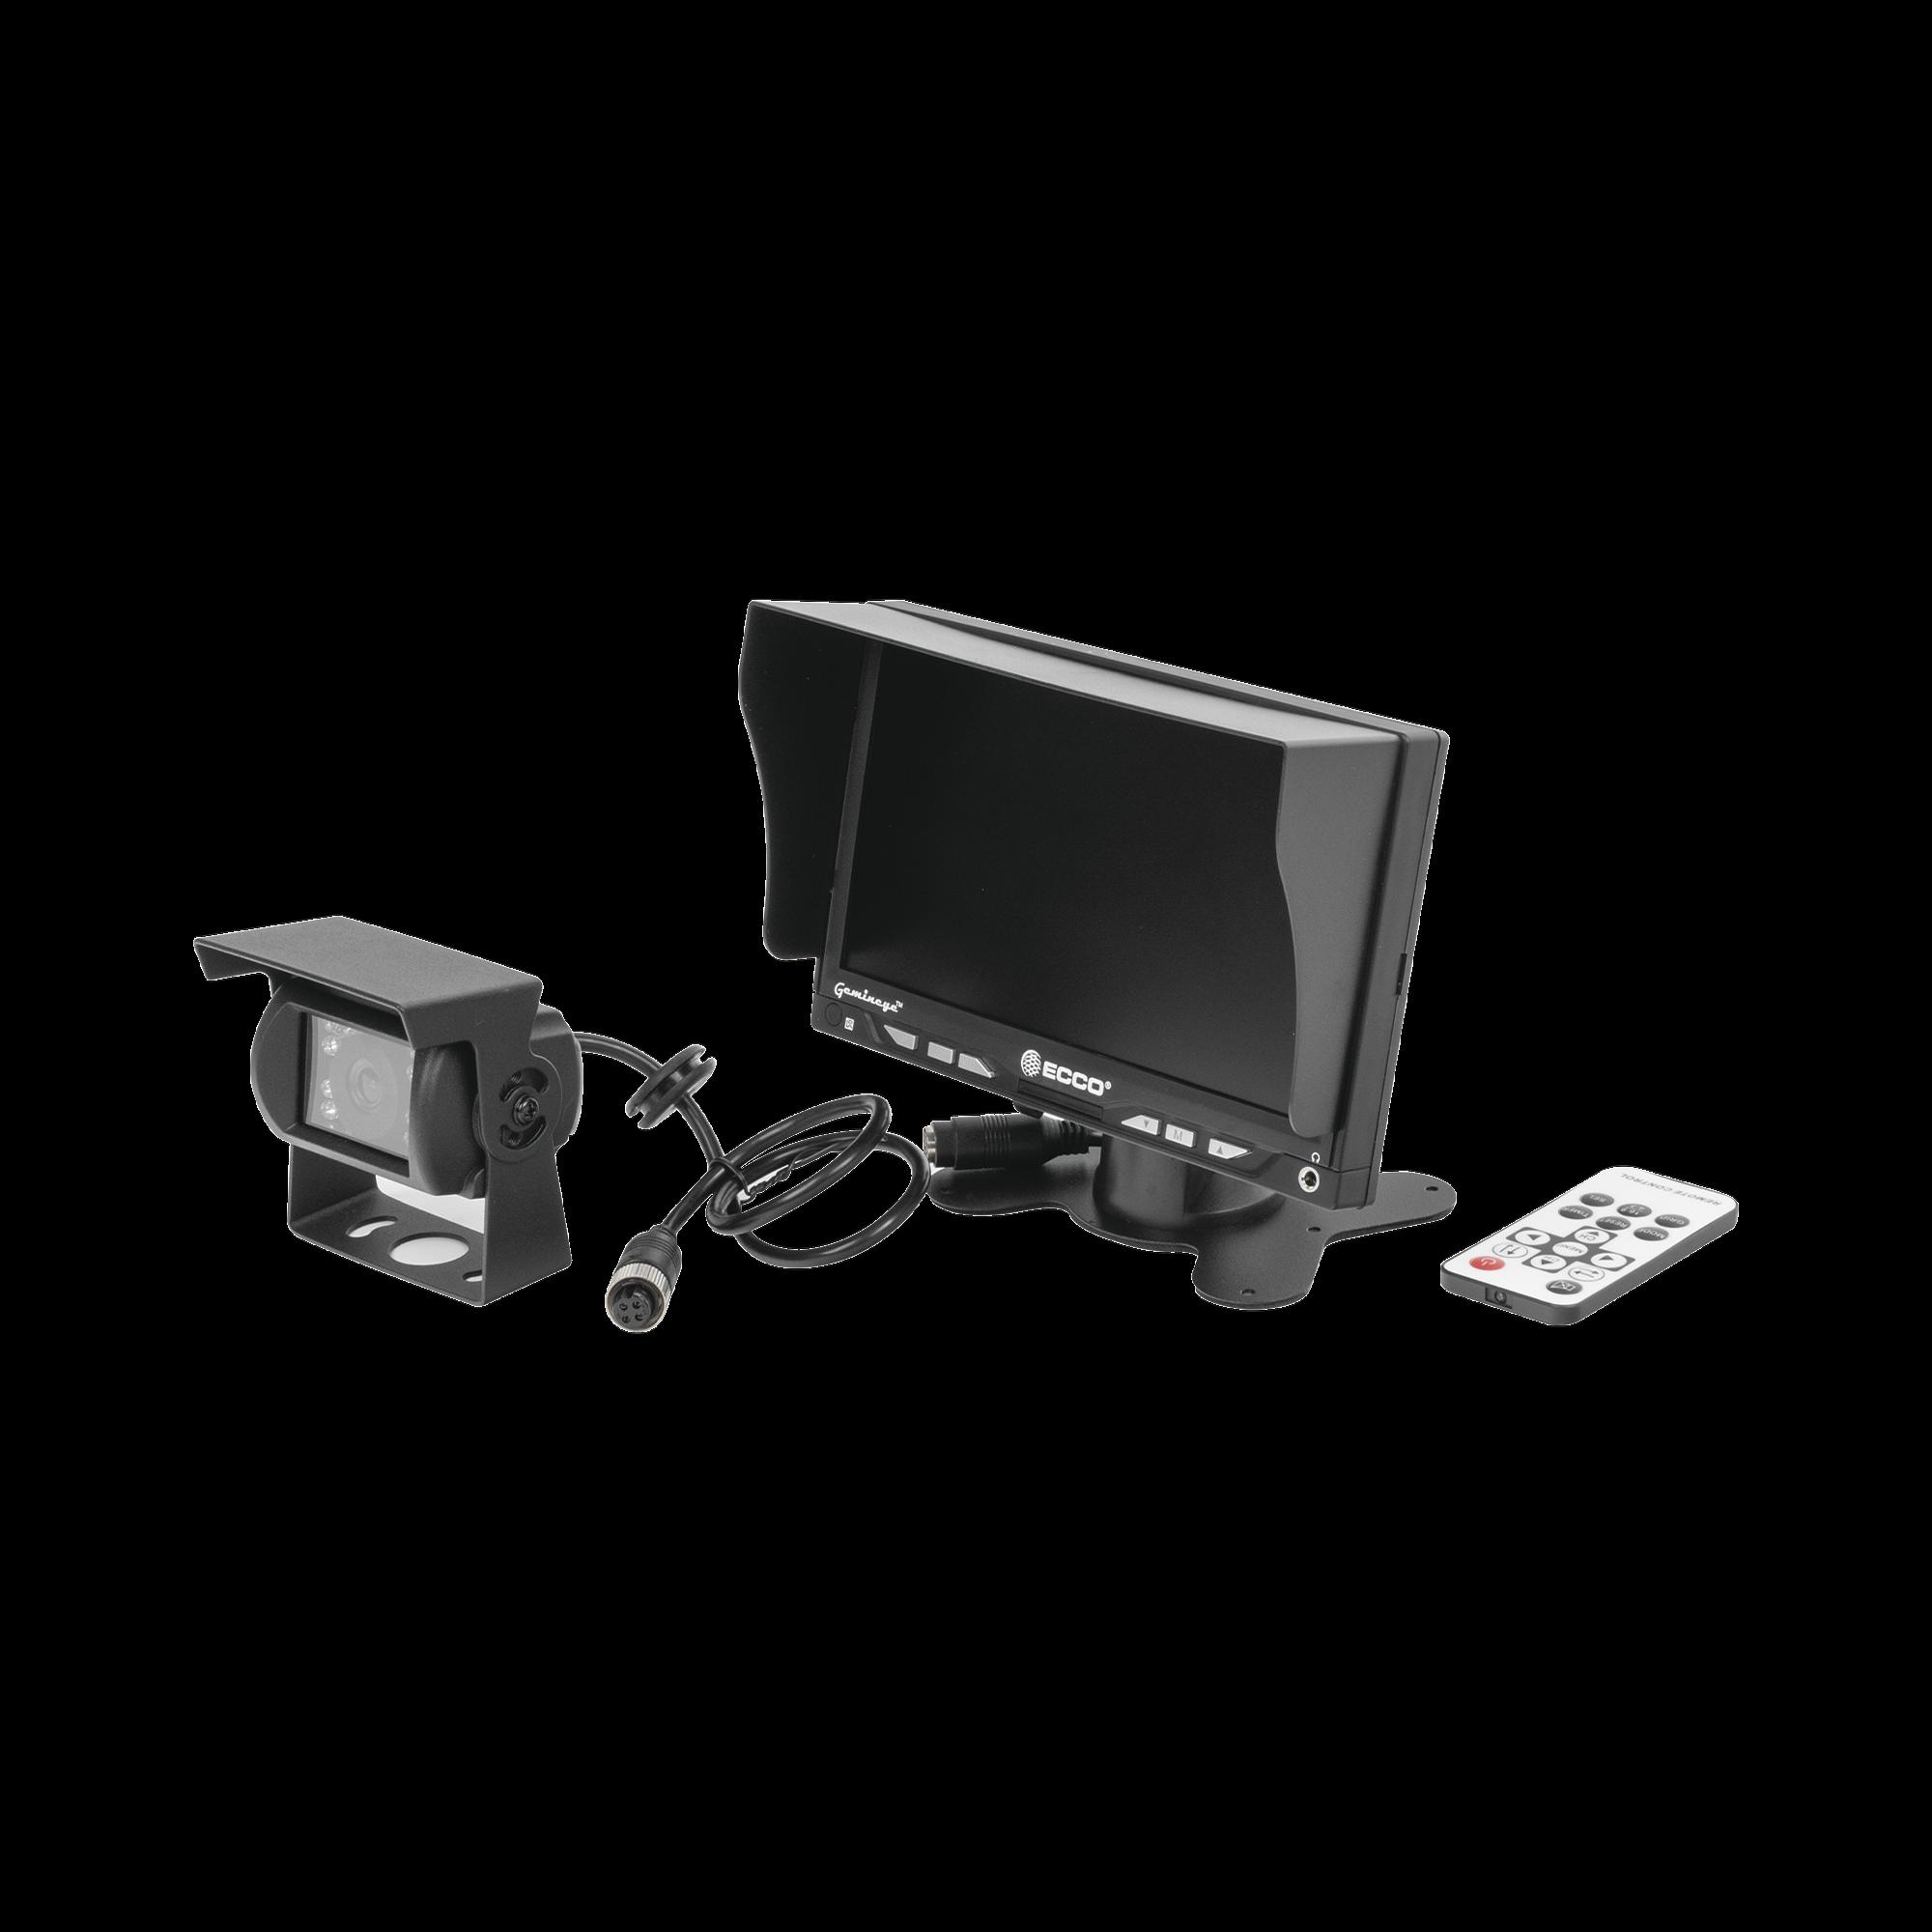 Kit basico de monitor y camara para montacargas